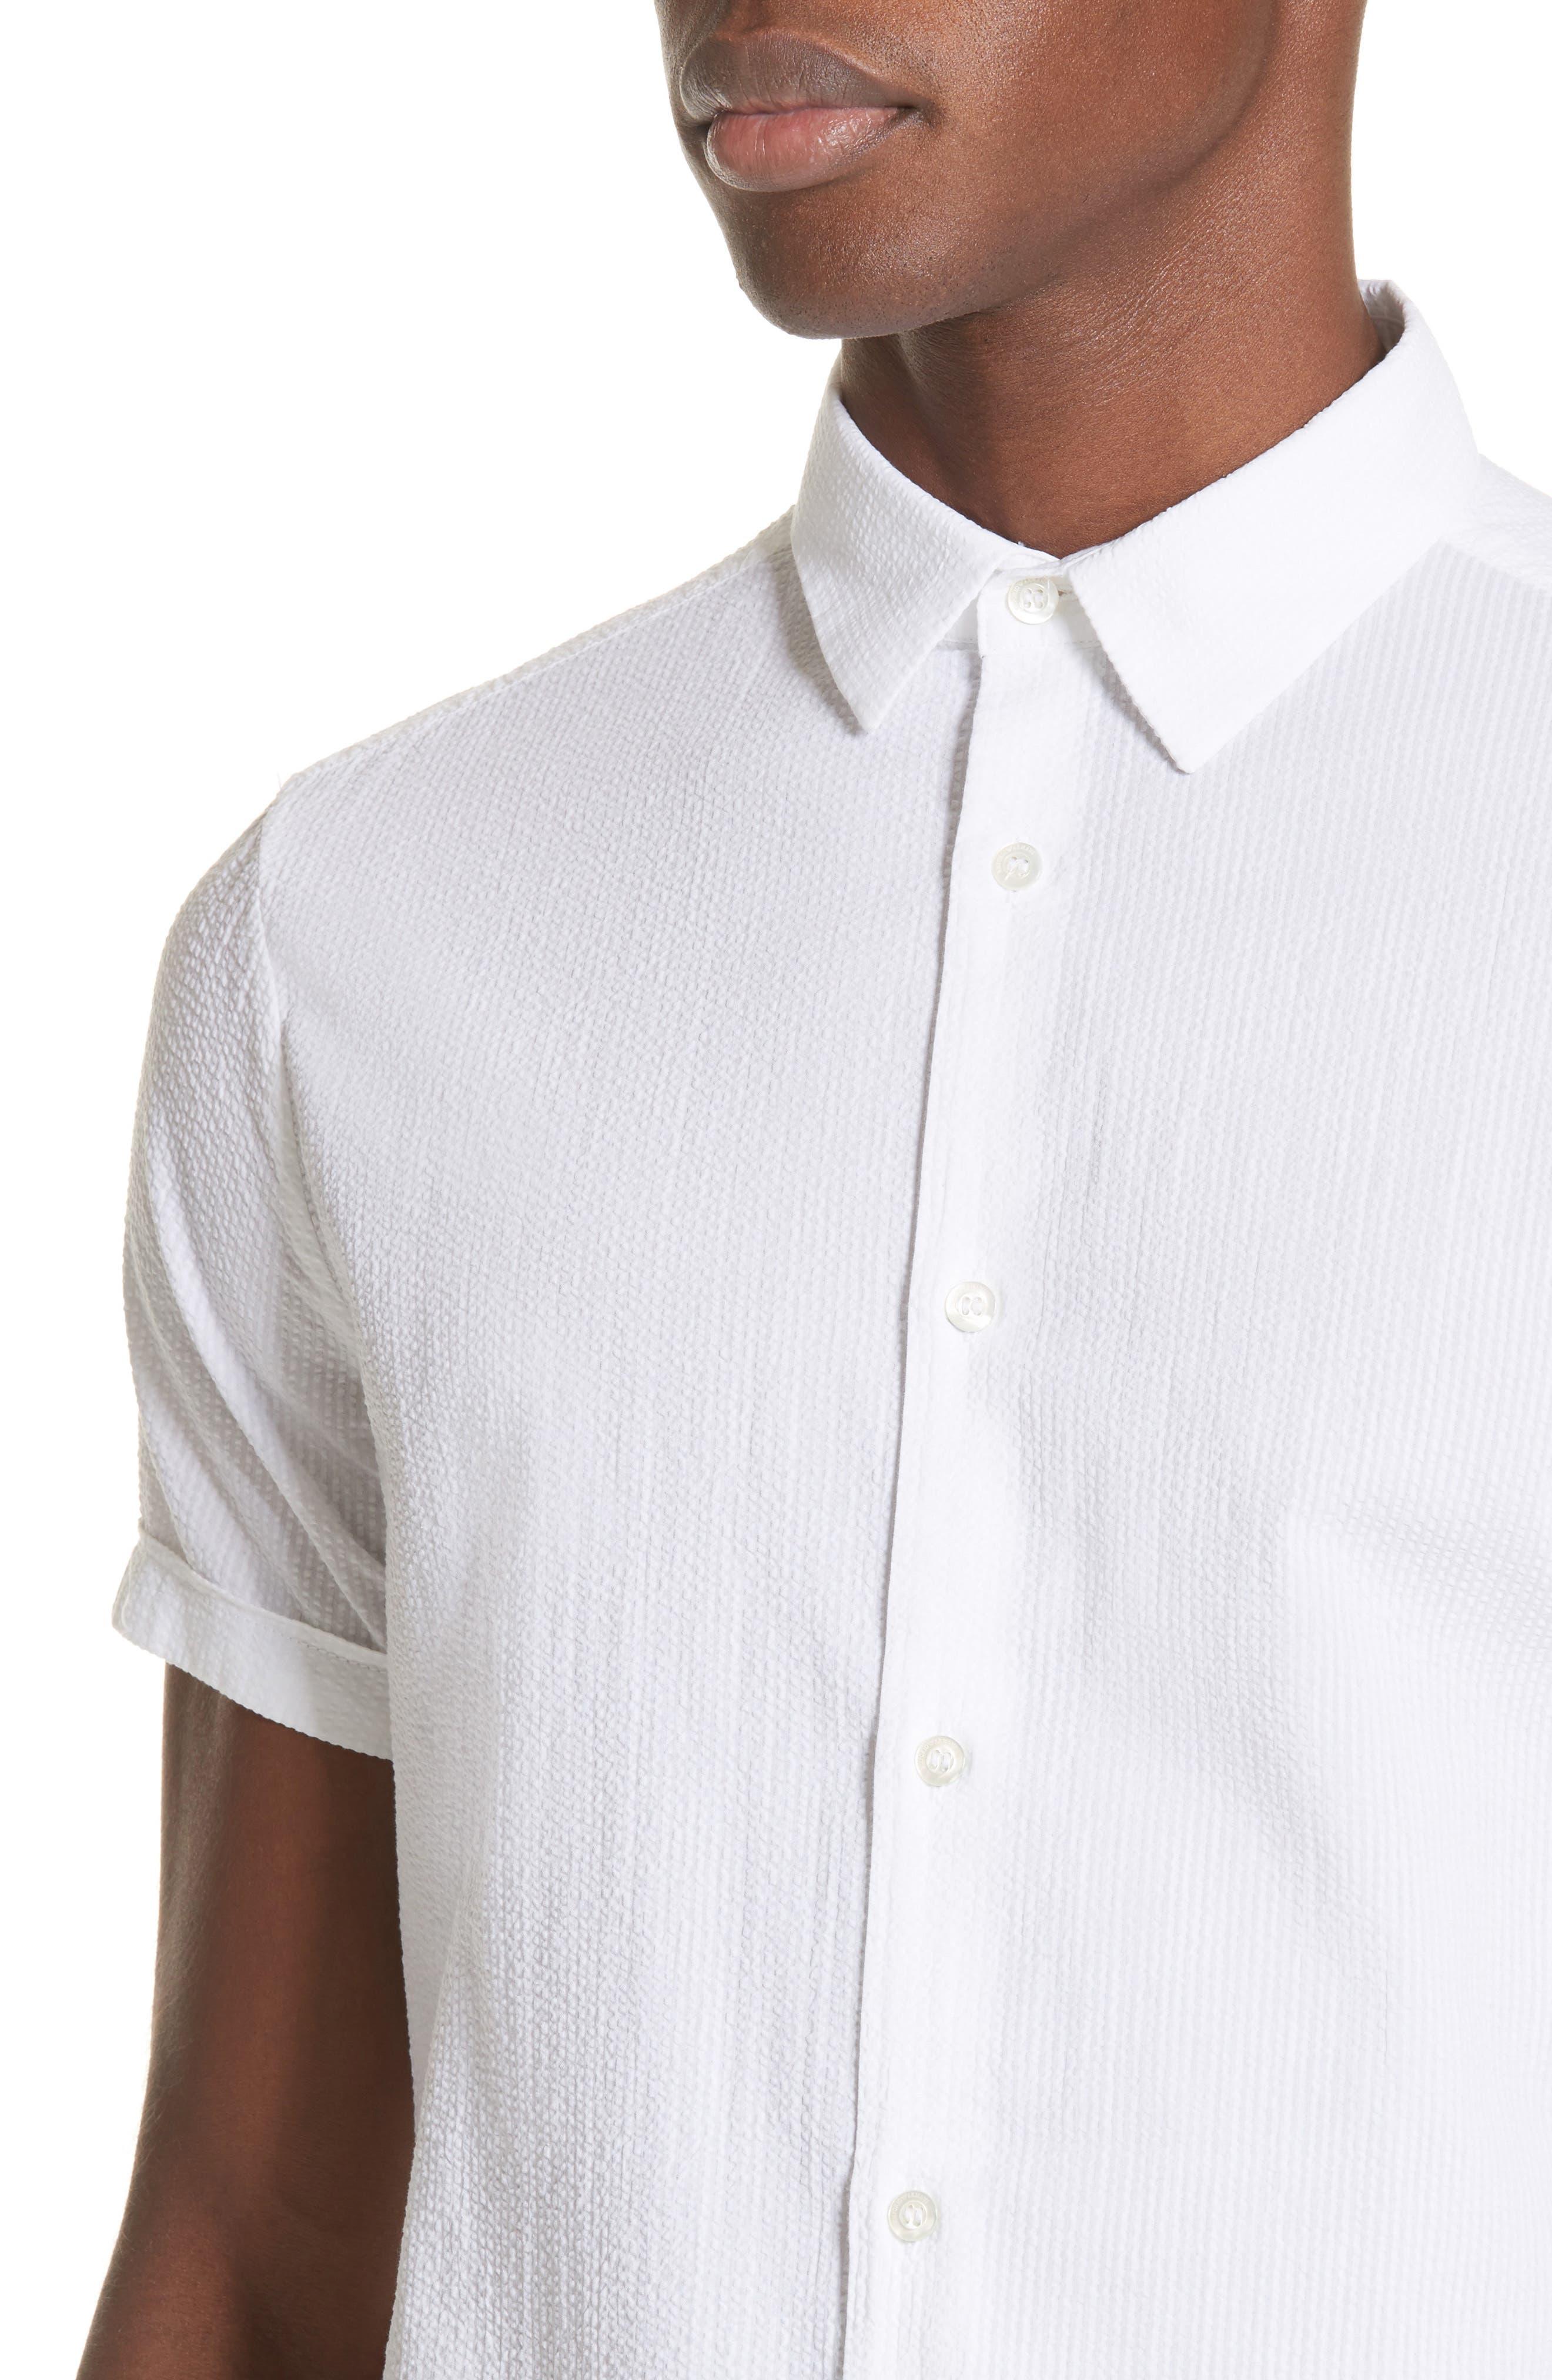 Regular Fit Short Sleeve Sport Shirt,                             Alternate thumbnail 4, color,                             BIANCO OTTICO